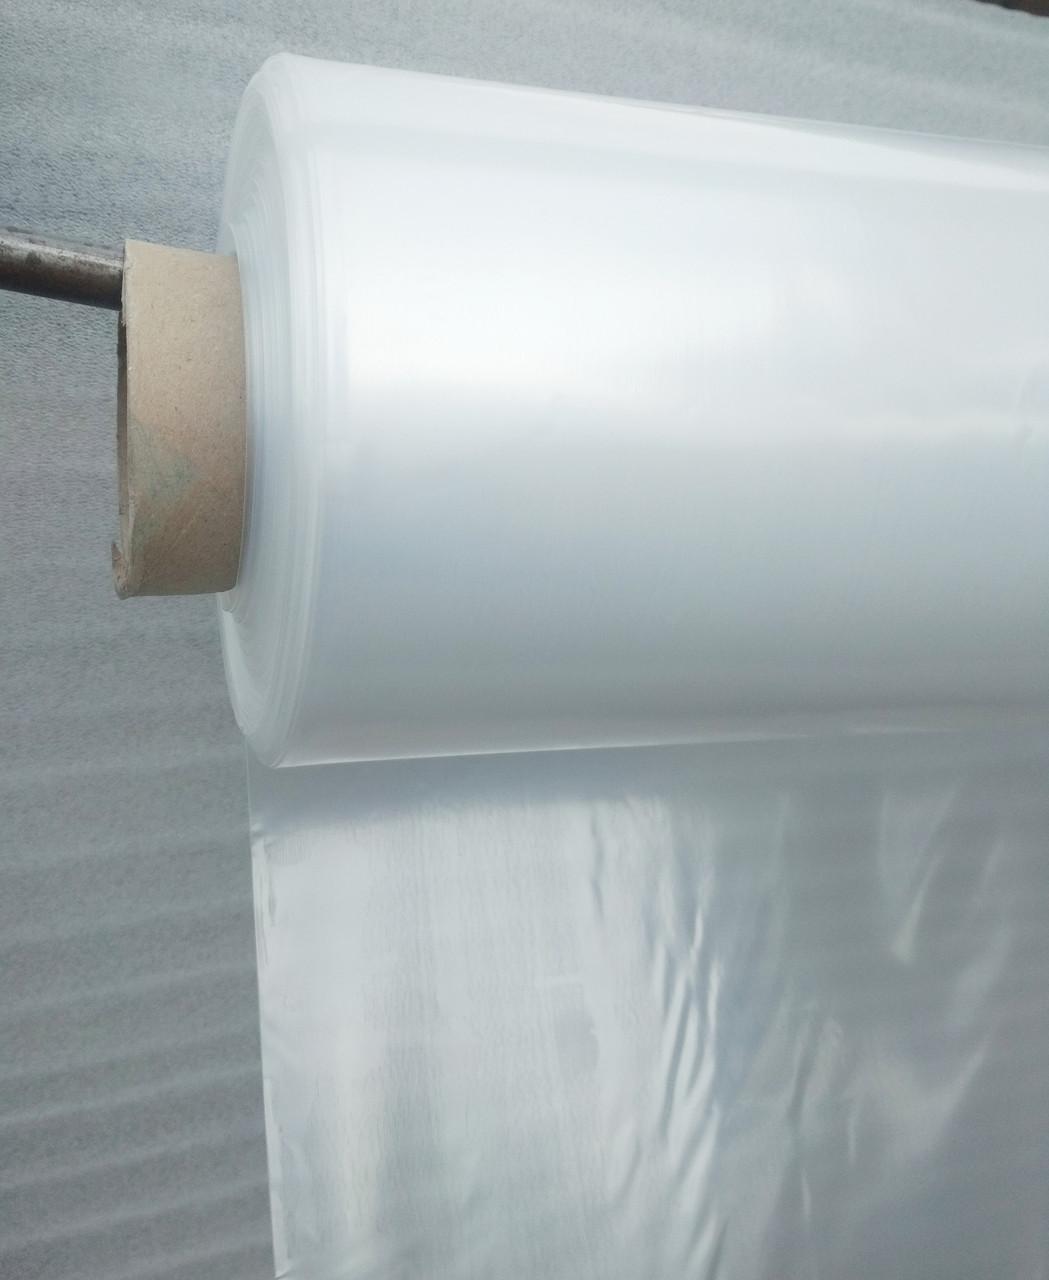 Пленка белая на метраж 120 мкм, ширина 3 метра (тепличная , парниковая , прозрачная).